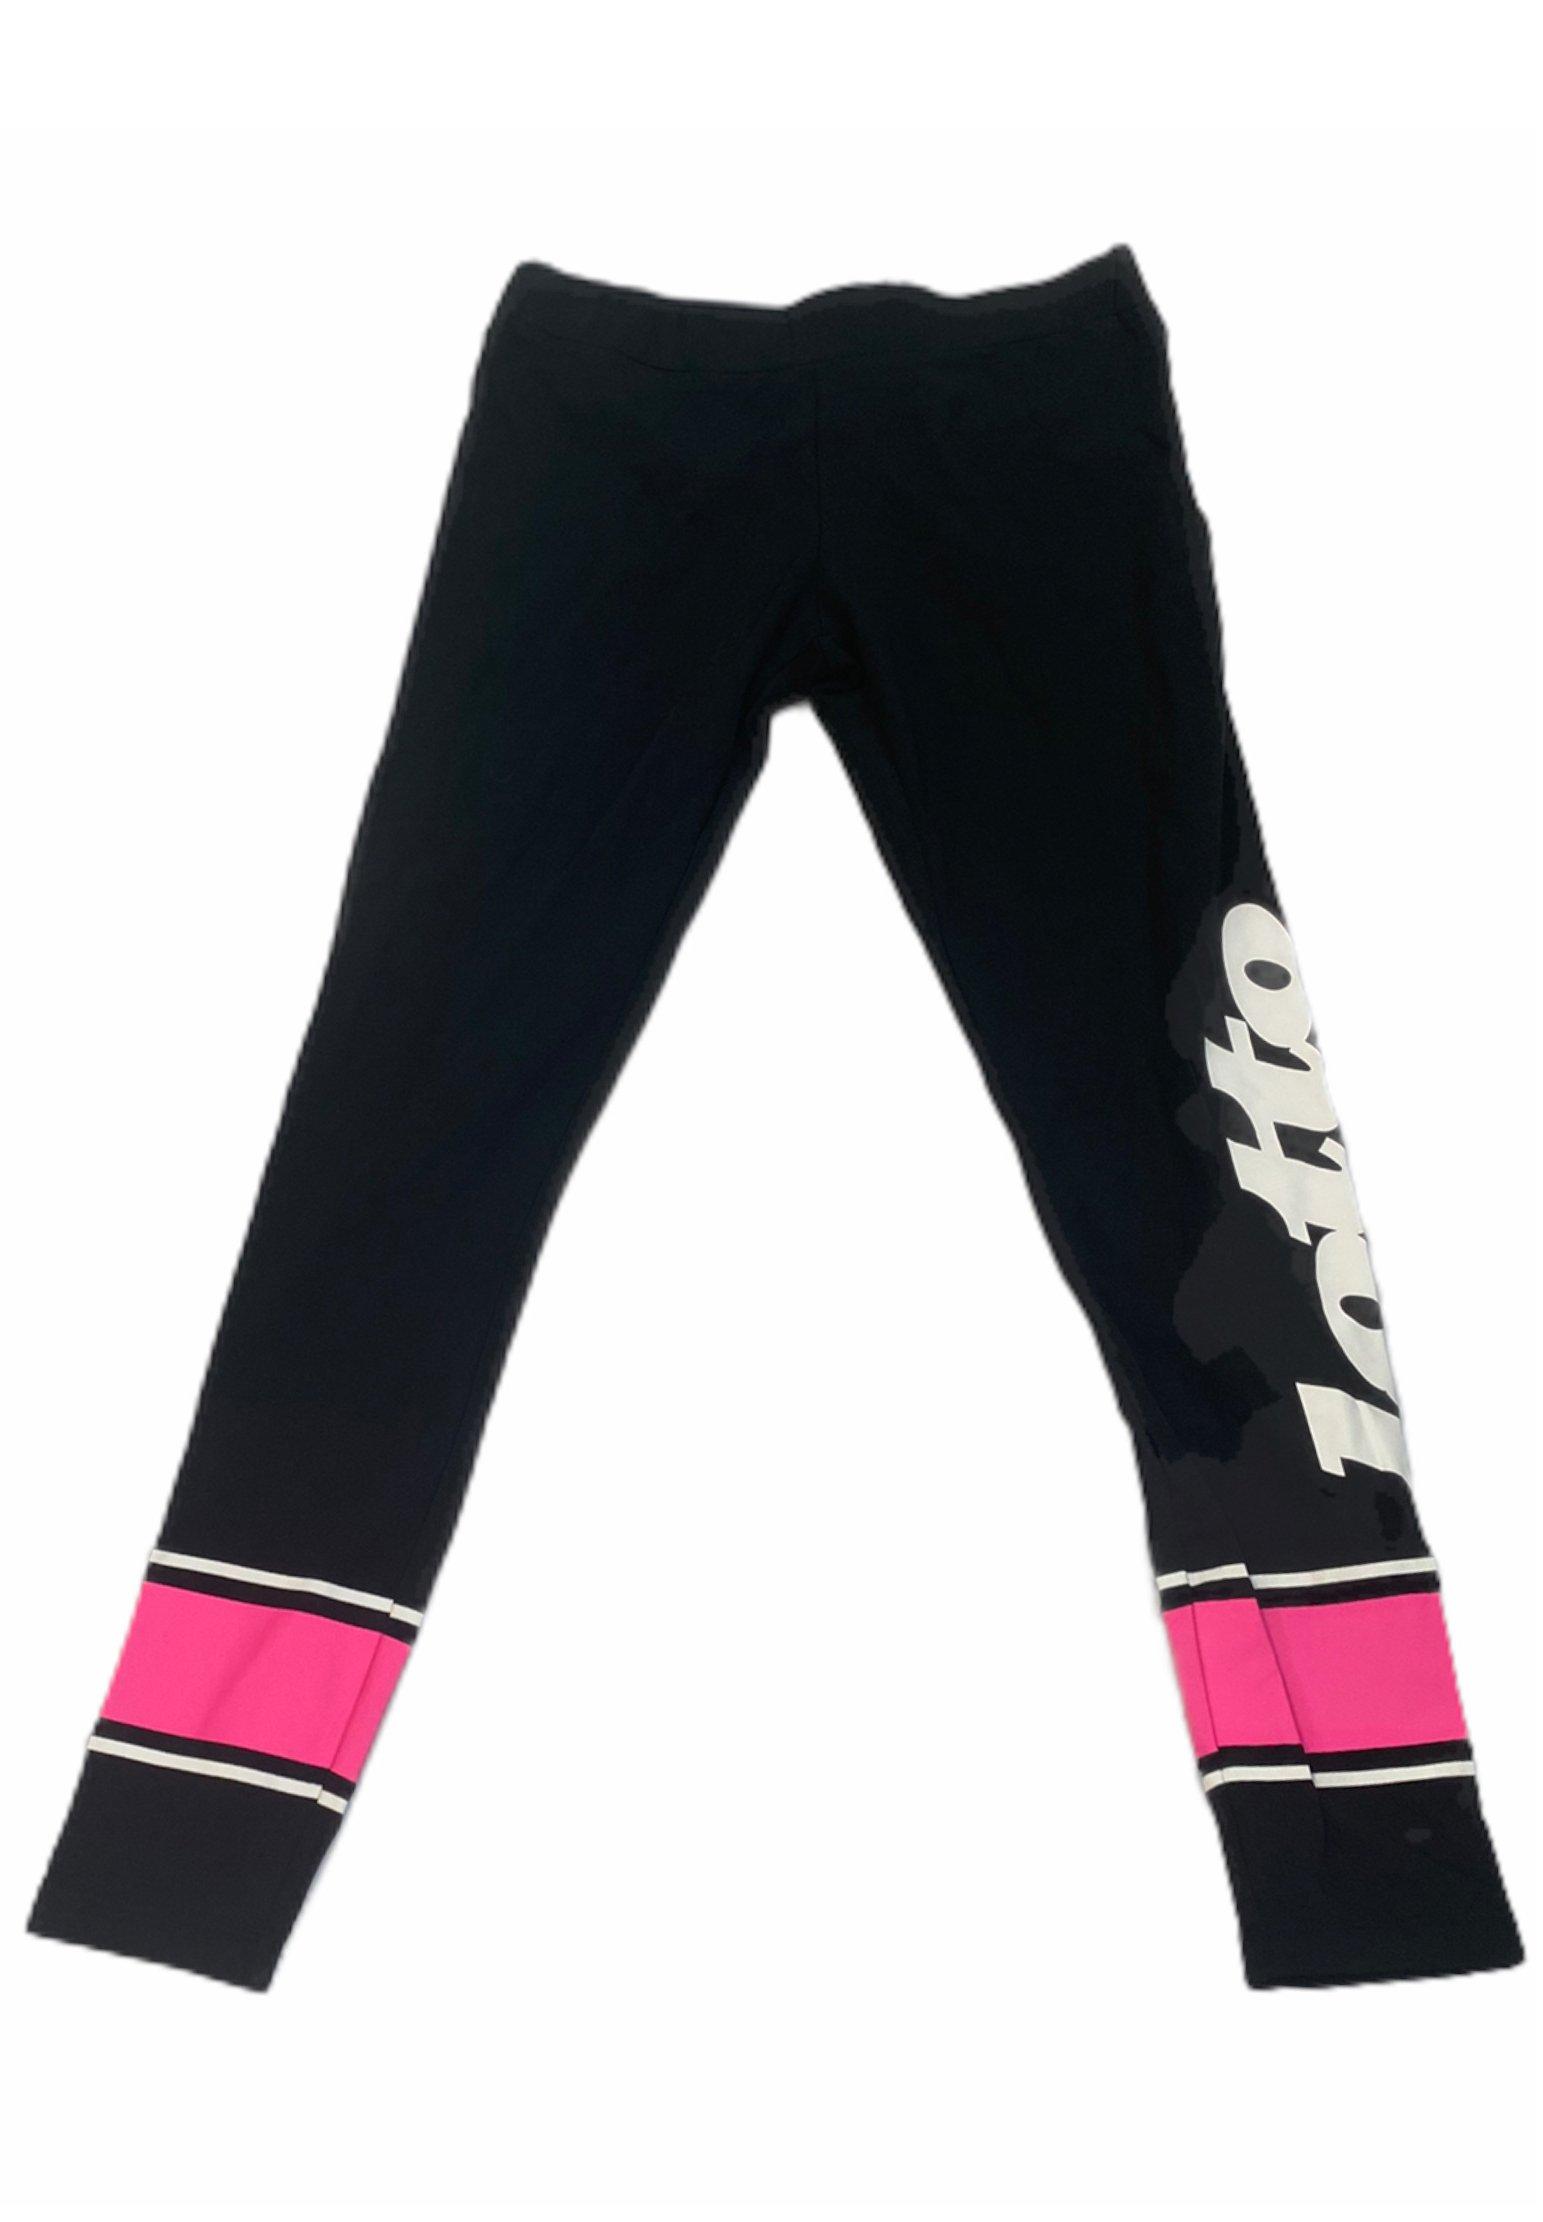 Damen ATHLETICA PRIME - Leggings - Hosen